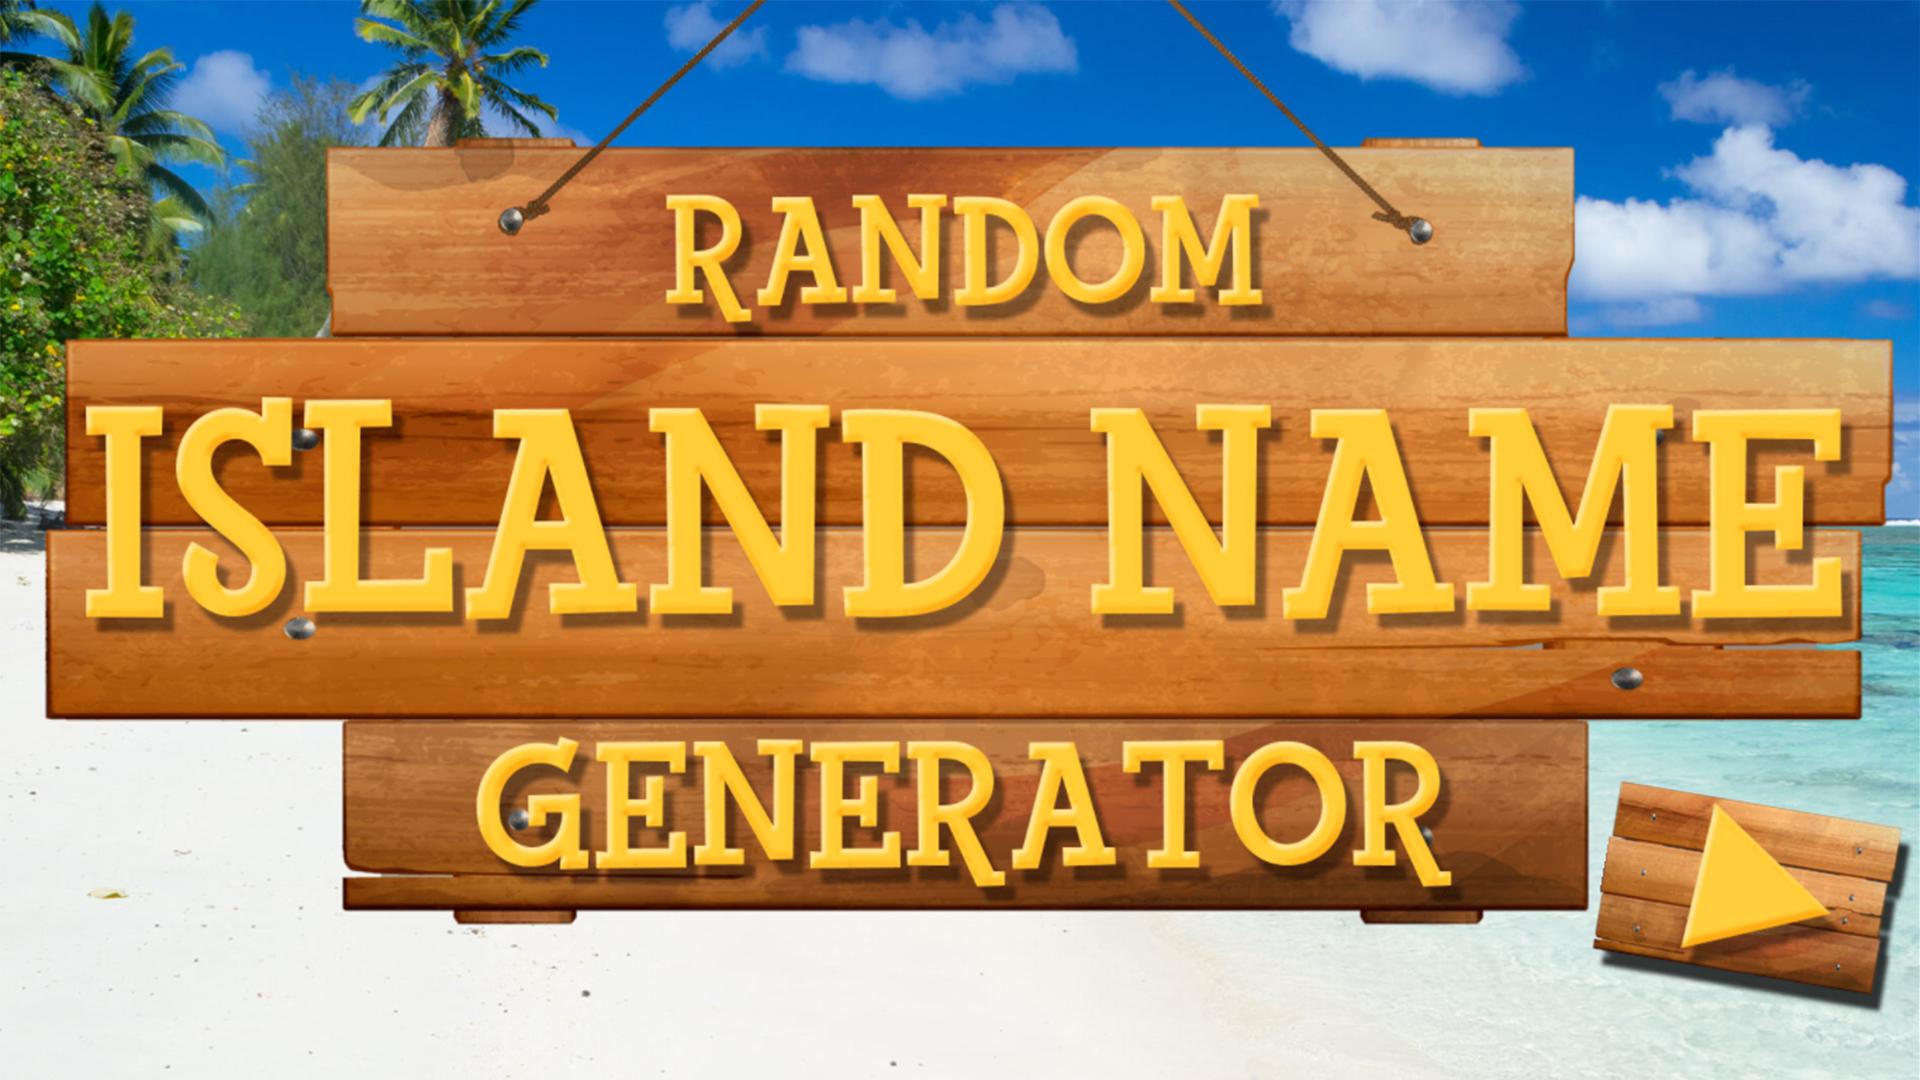 The Random Island Name Generator